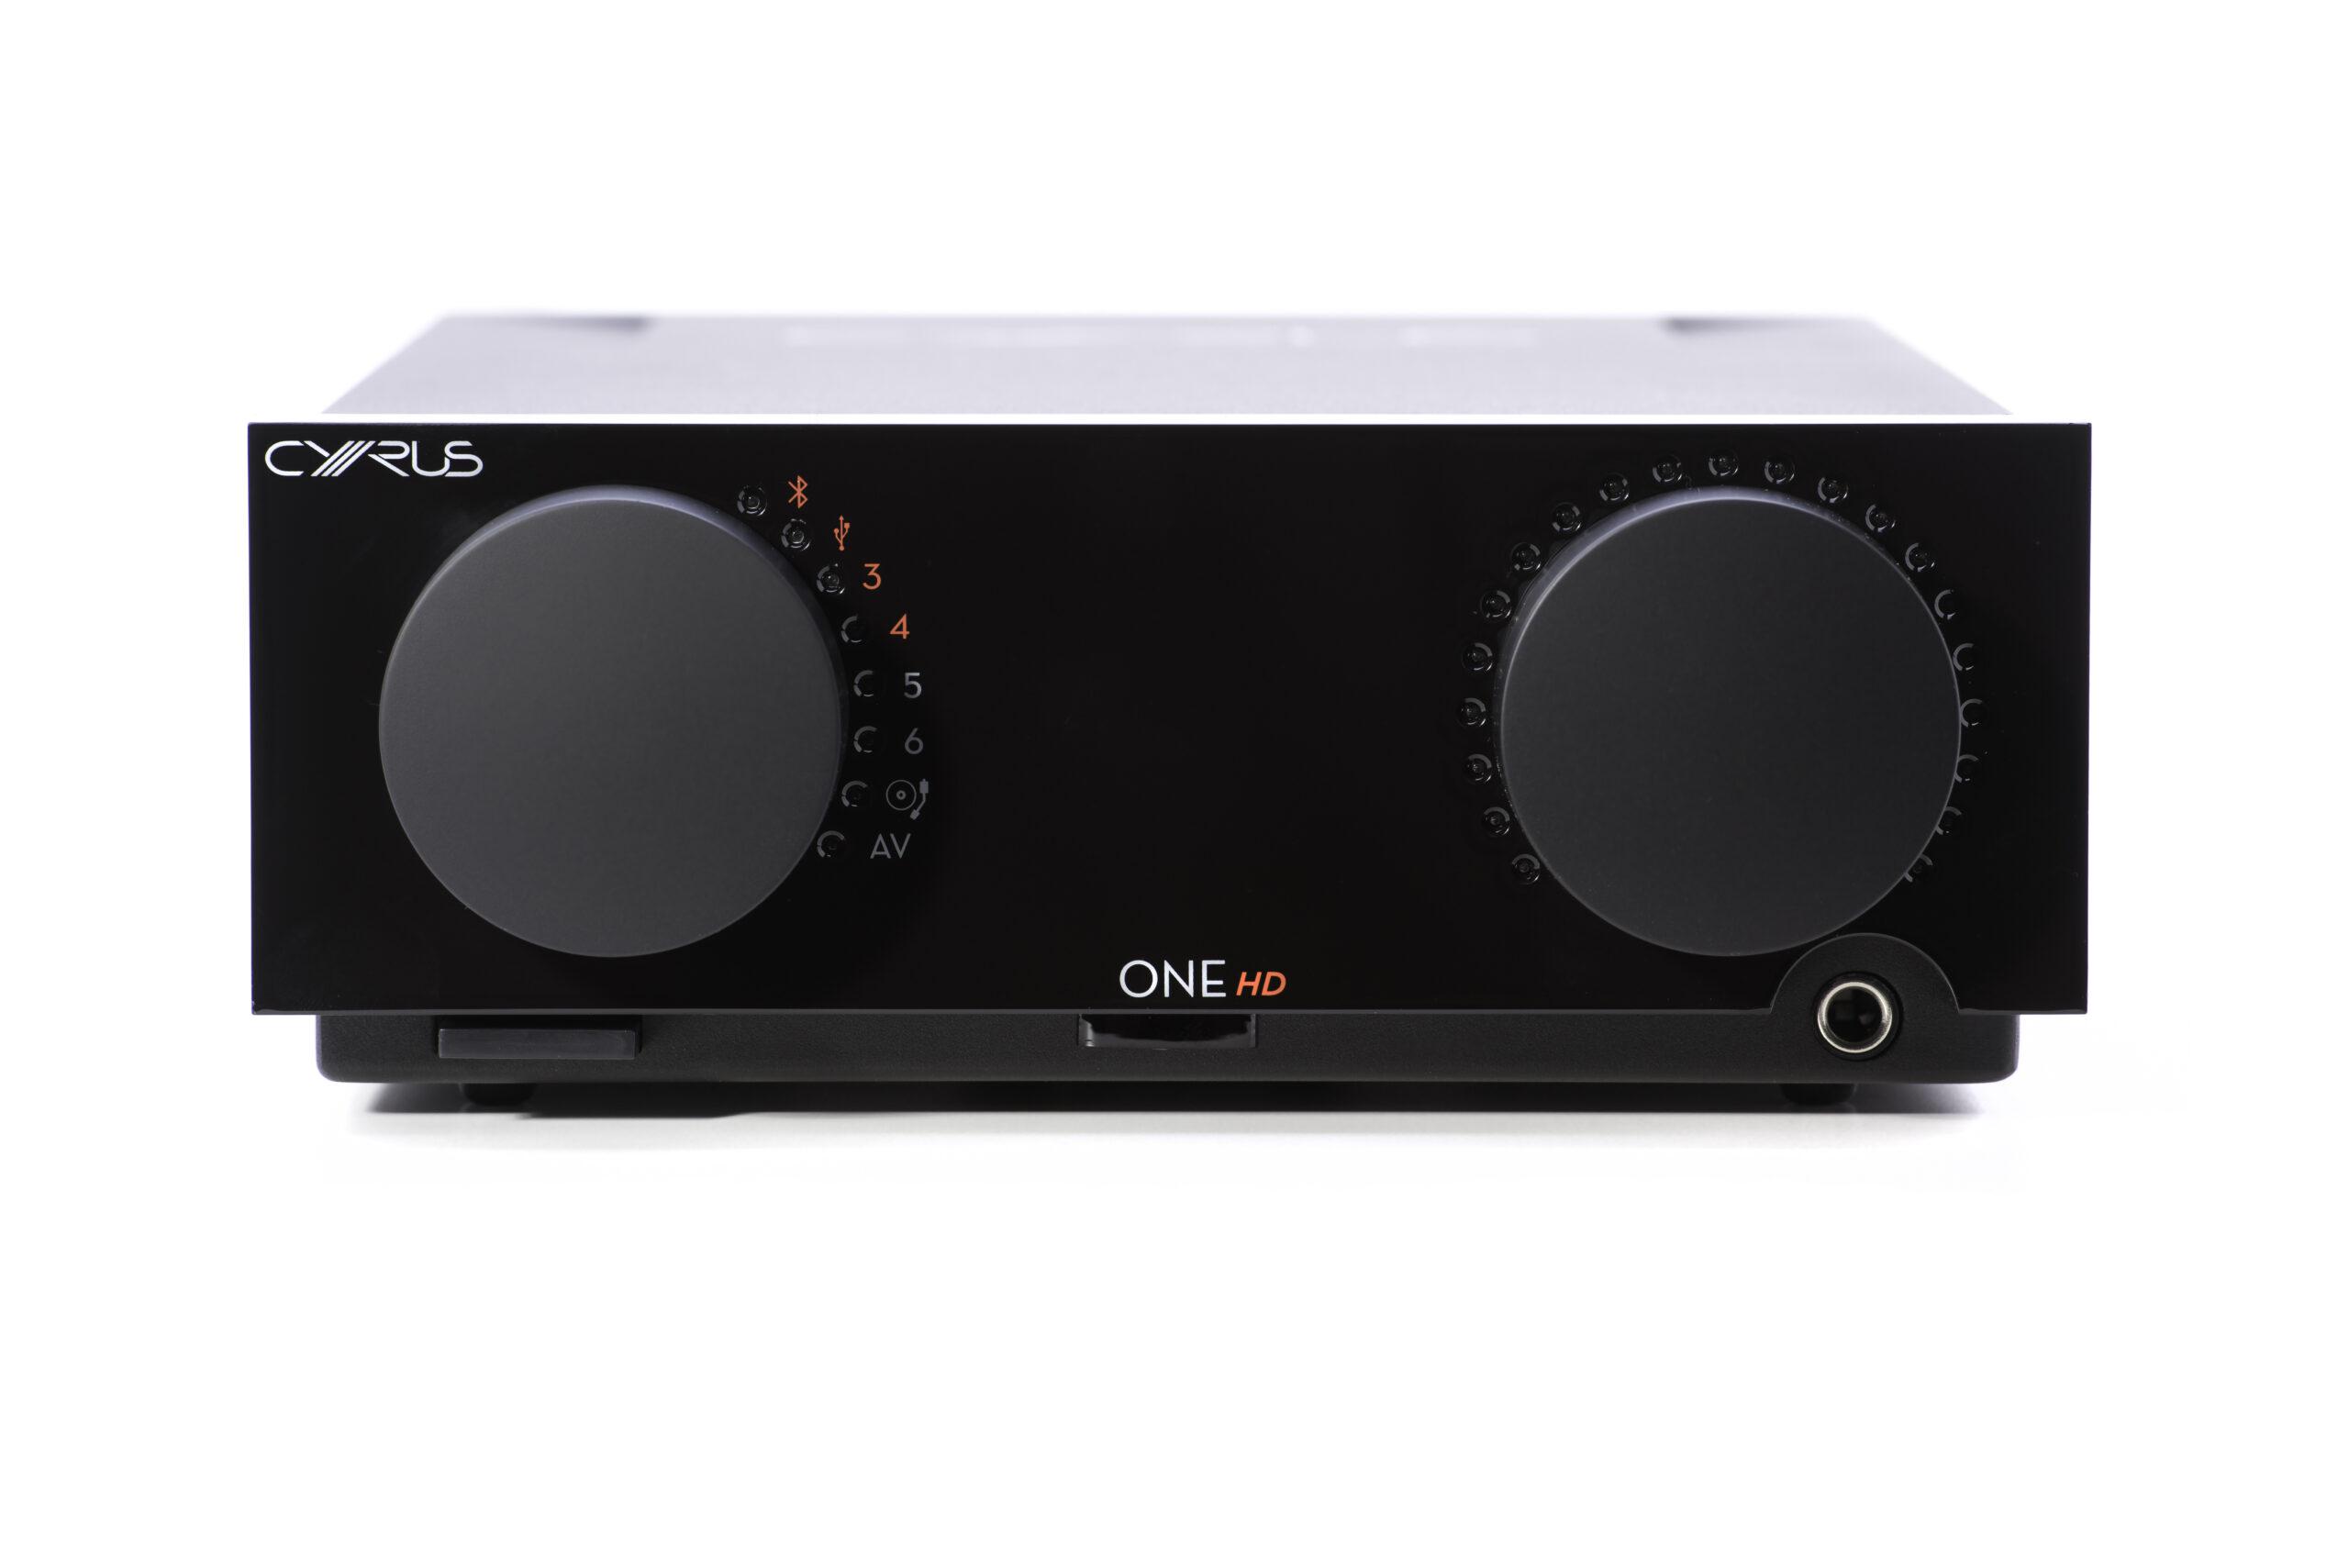 Cyrus Audio ONE HD